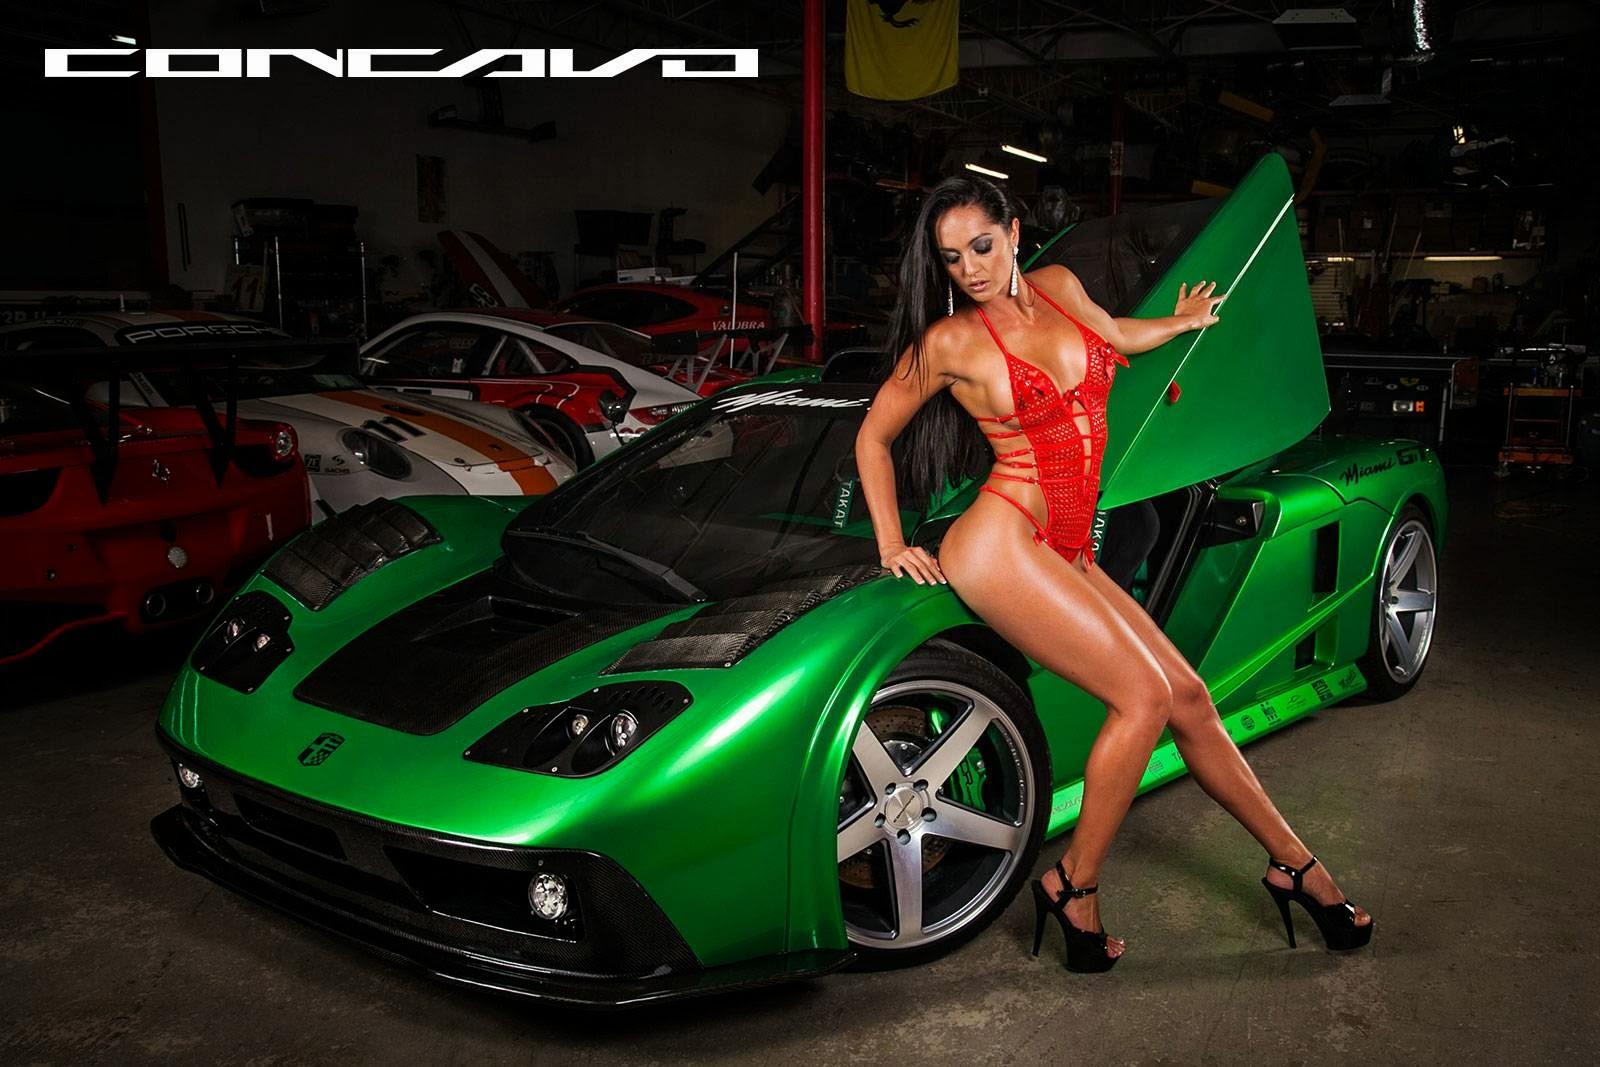 All Cars NZ: 2013 DDR Motorsport Miami GT